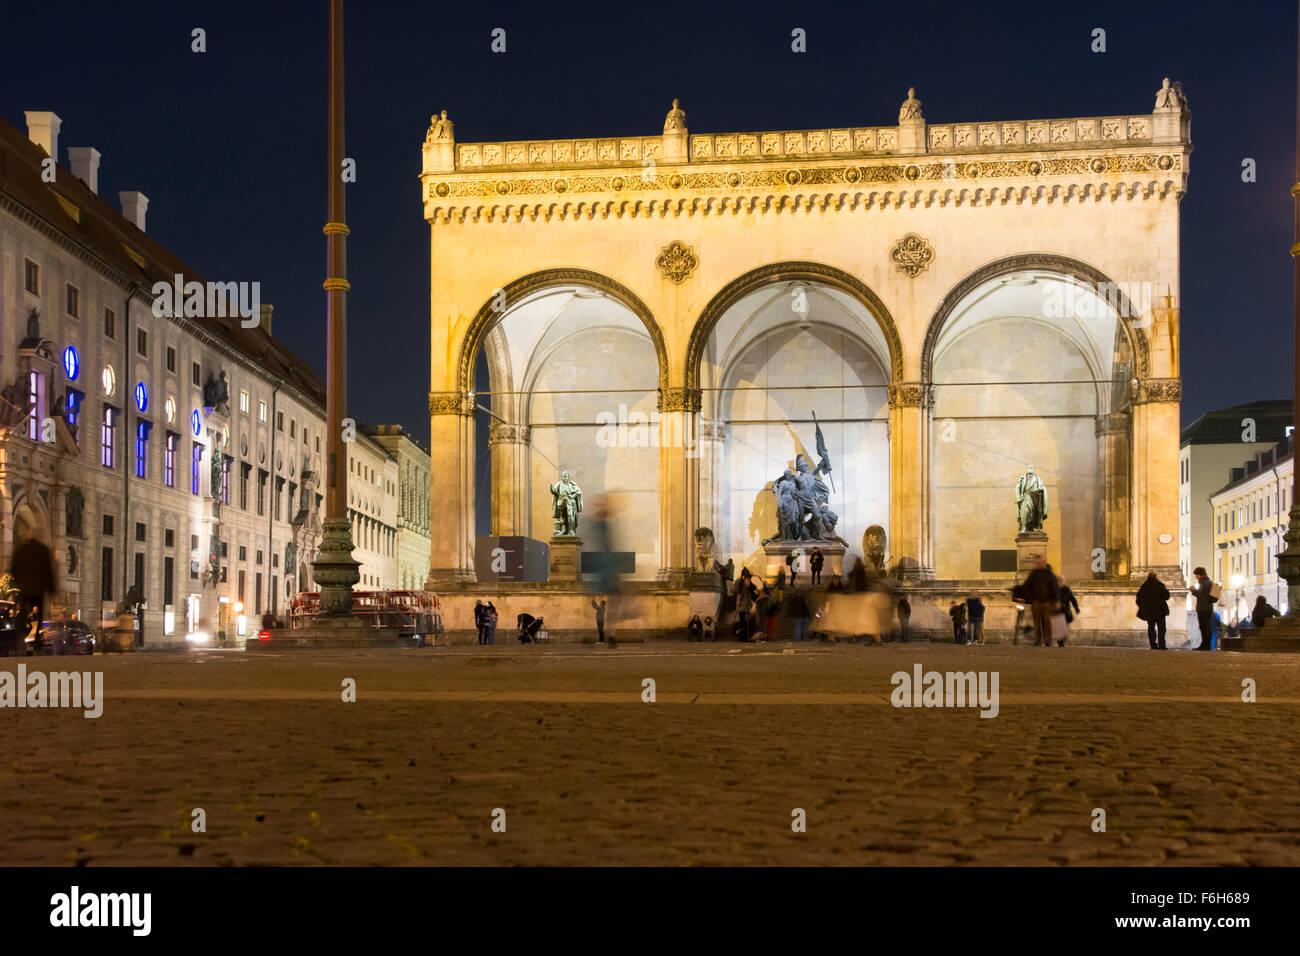 MUNICH, GERMANY - OKTOBER 26: Tourists at the Feldherrnhalle in Munich, Germany on Oktober 26, 2015. - Stock Image